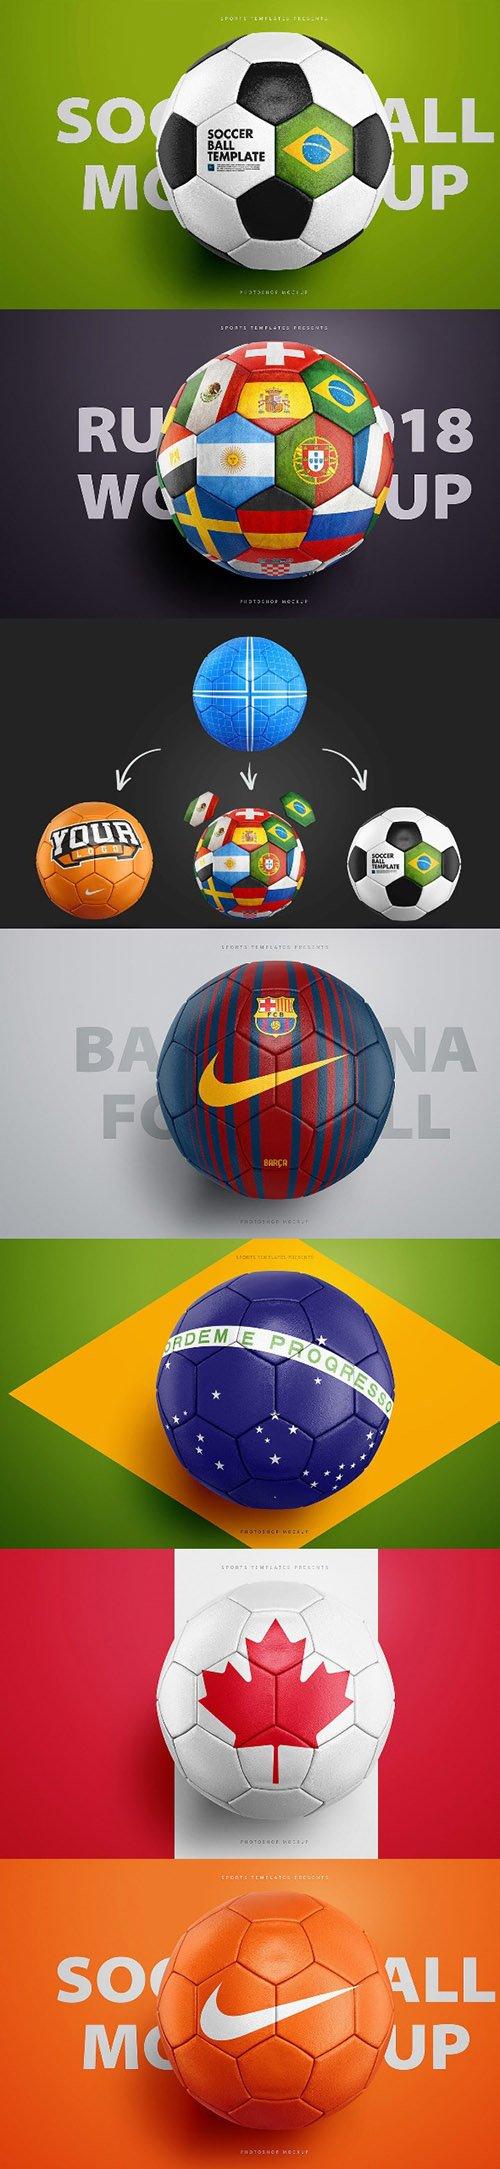 Football / Soccer Ball Photoshop Mockup PSD